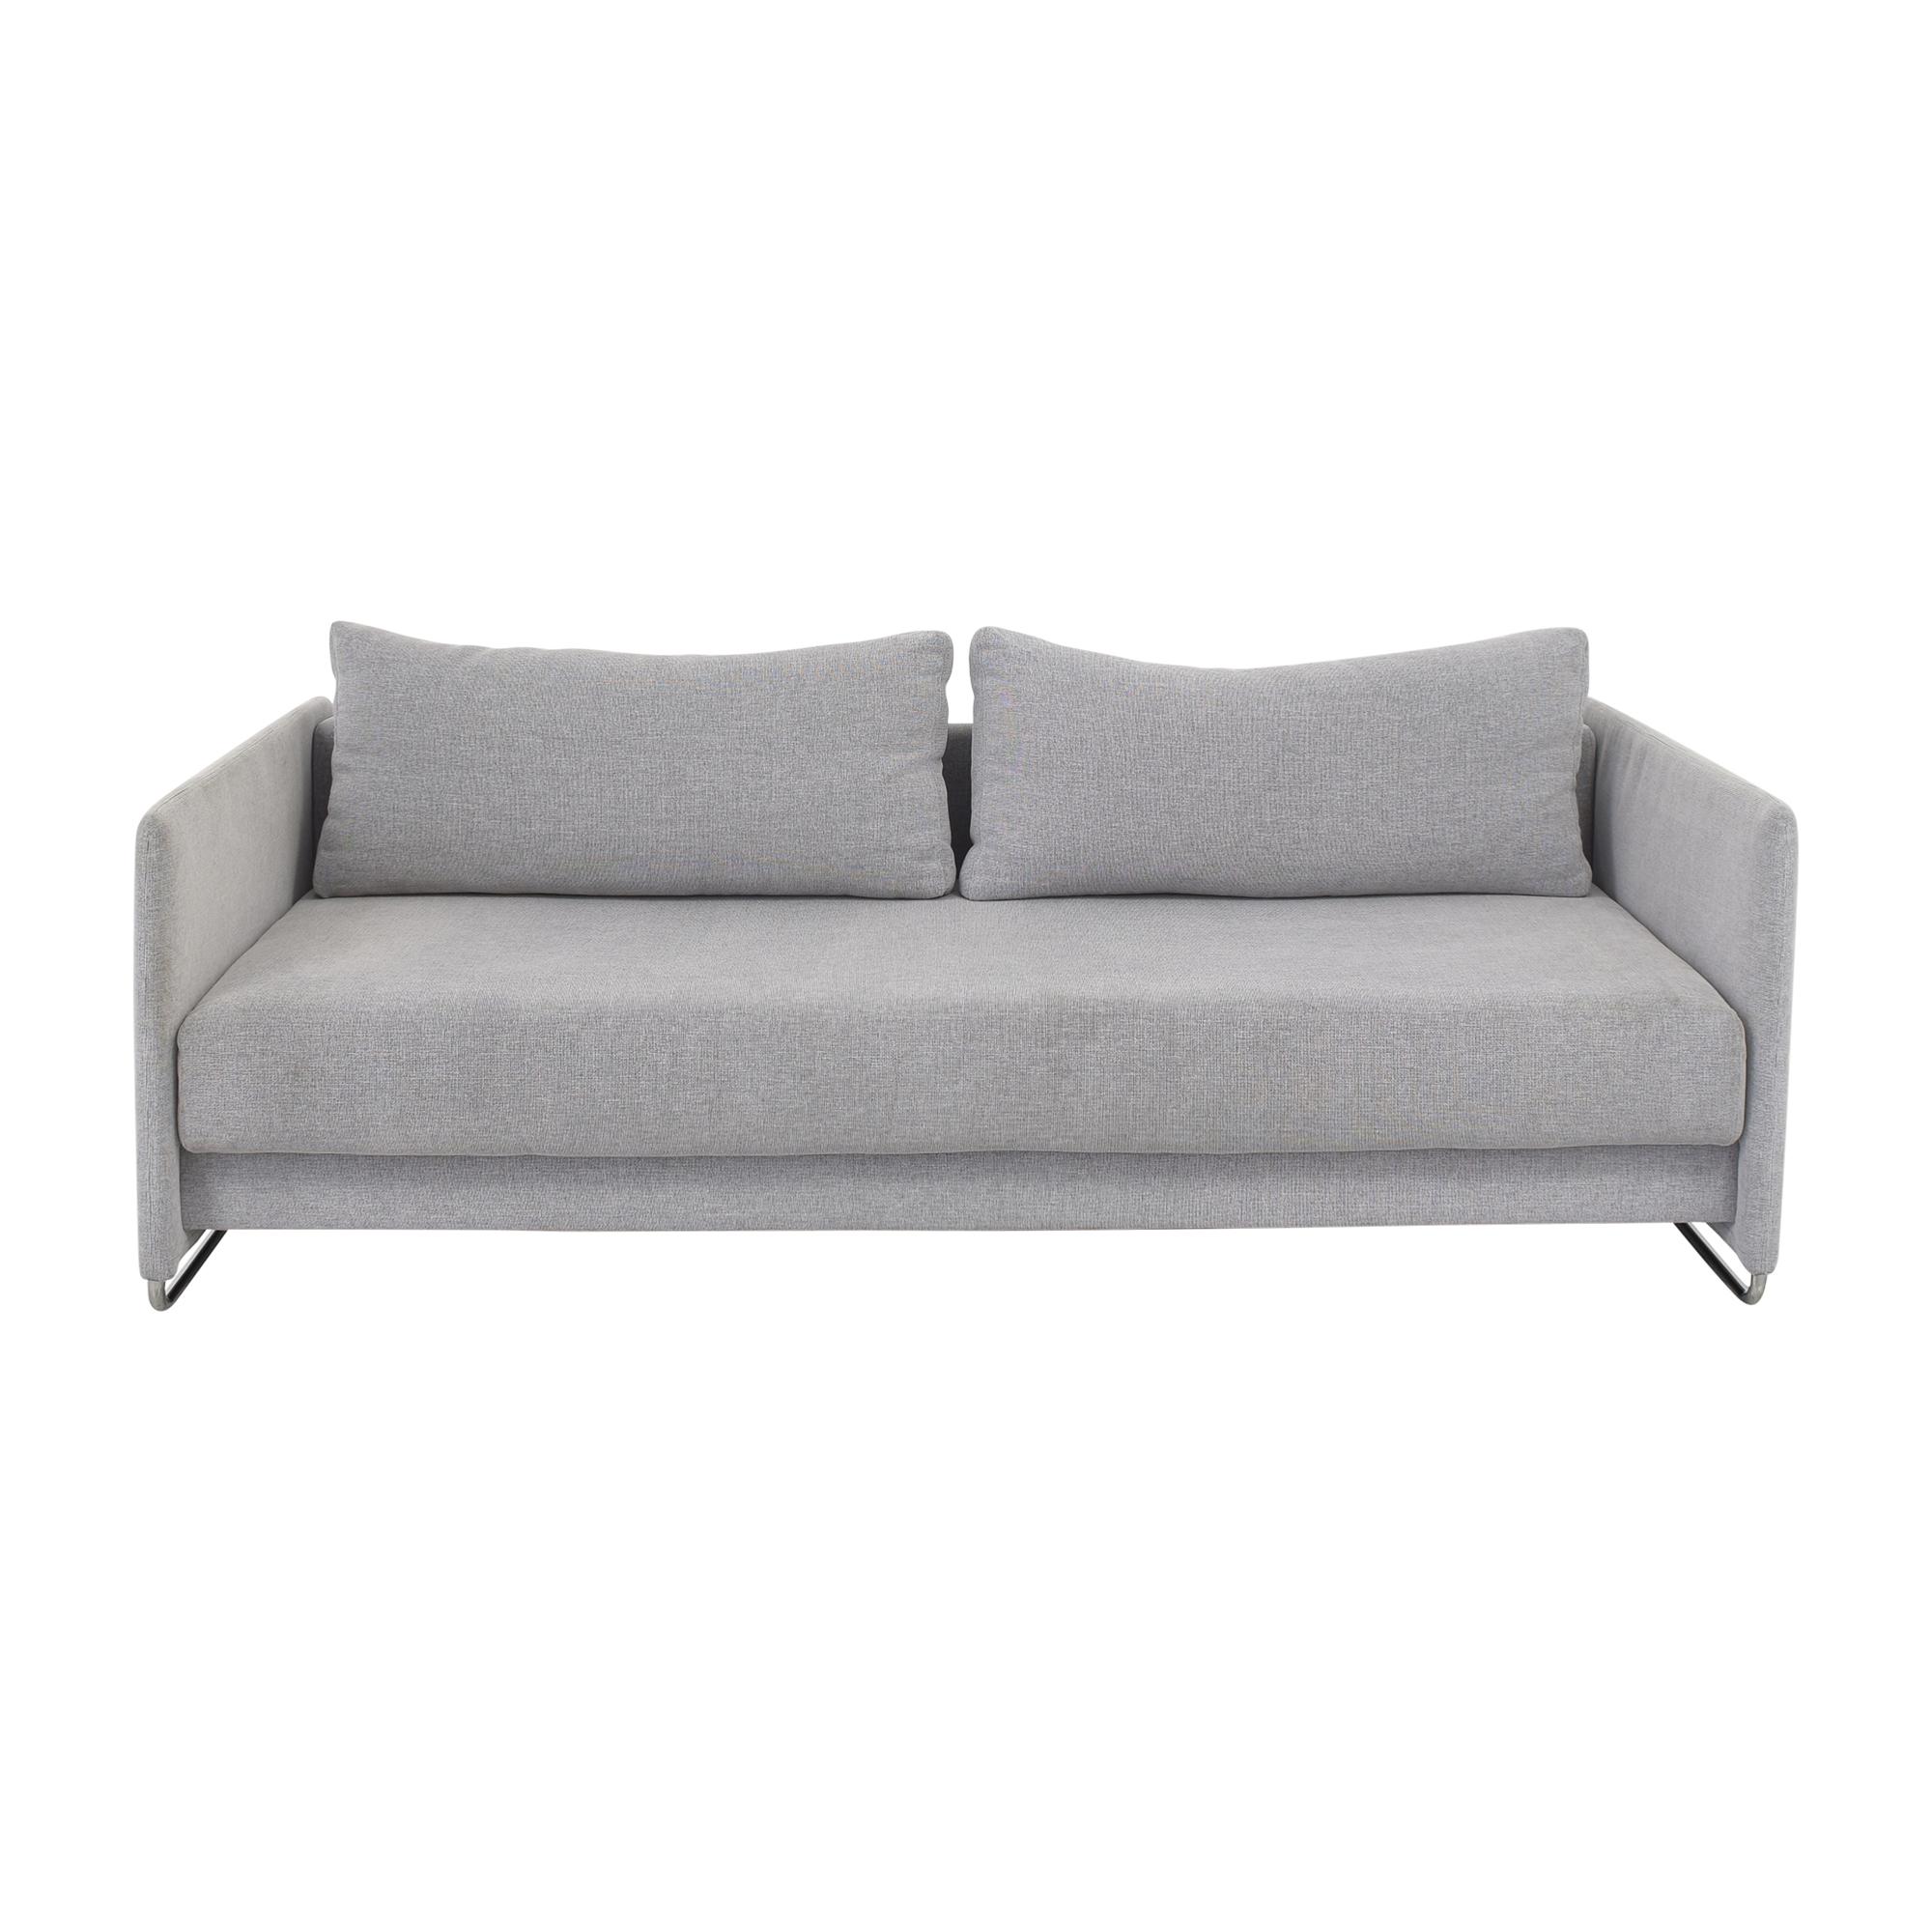 CB2 CB2 Tandom Microgrid Sleeper Sofa on sale